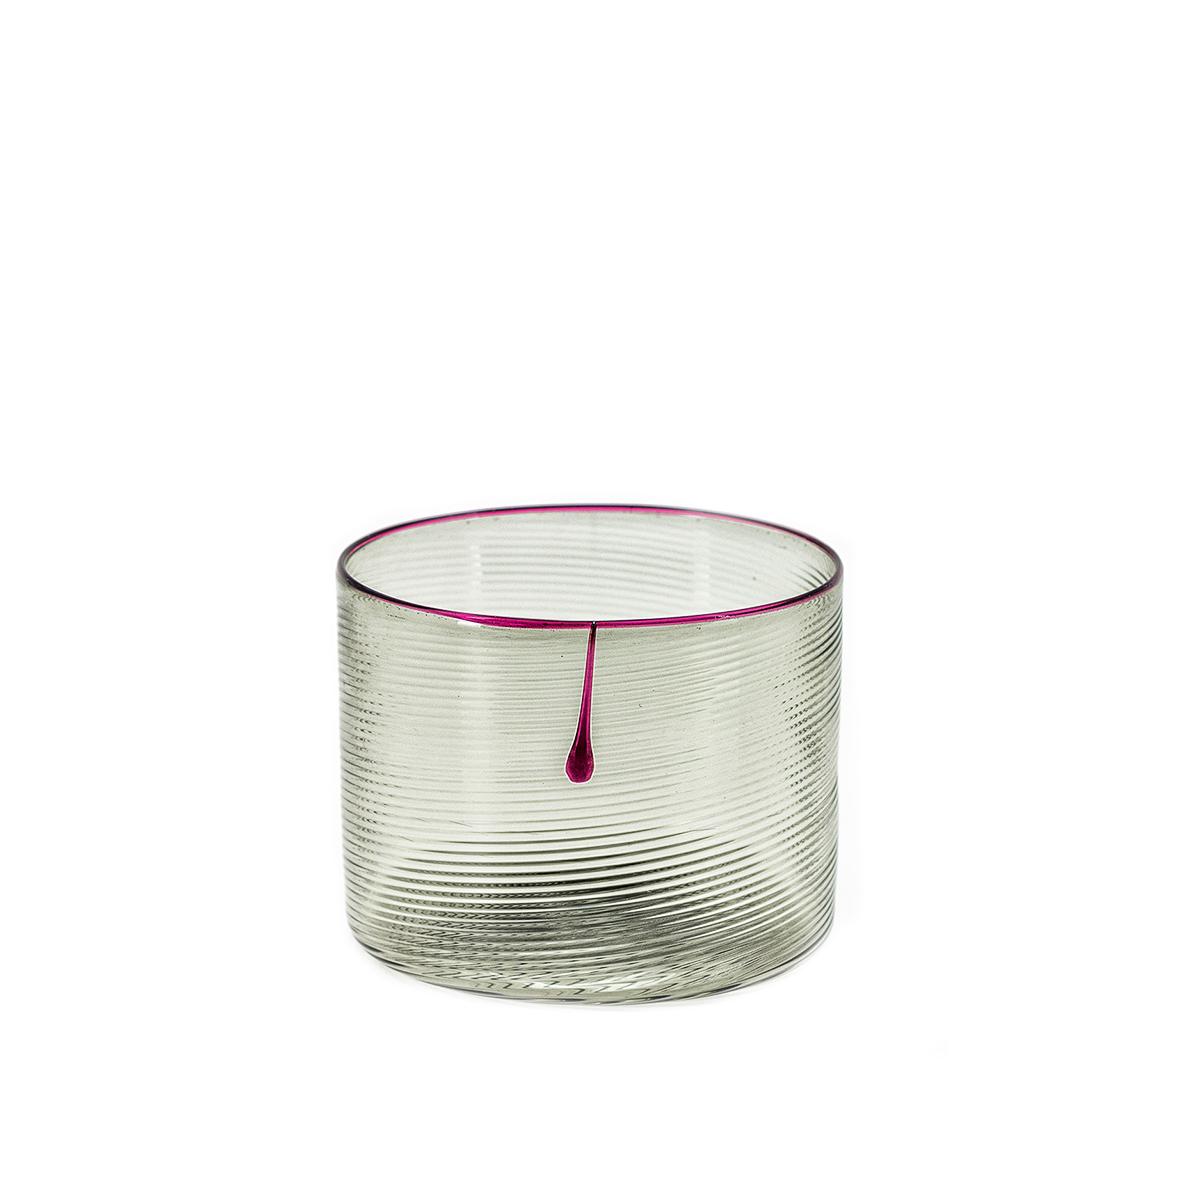 tancredi-glass-murano-design-giberto-luxury-handmade-wine-drink-tear-drop